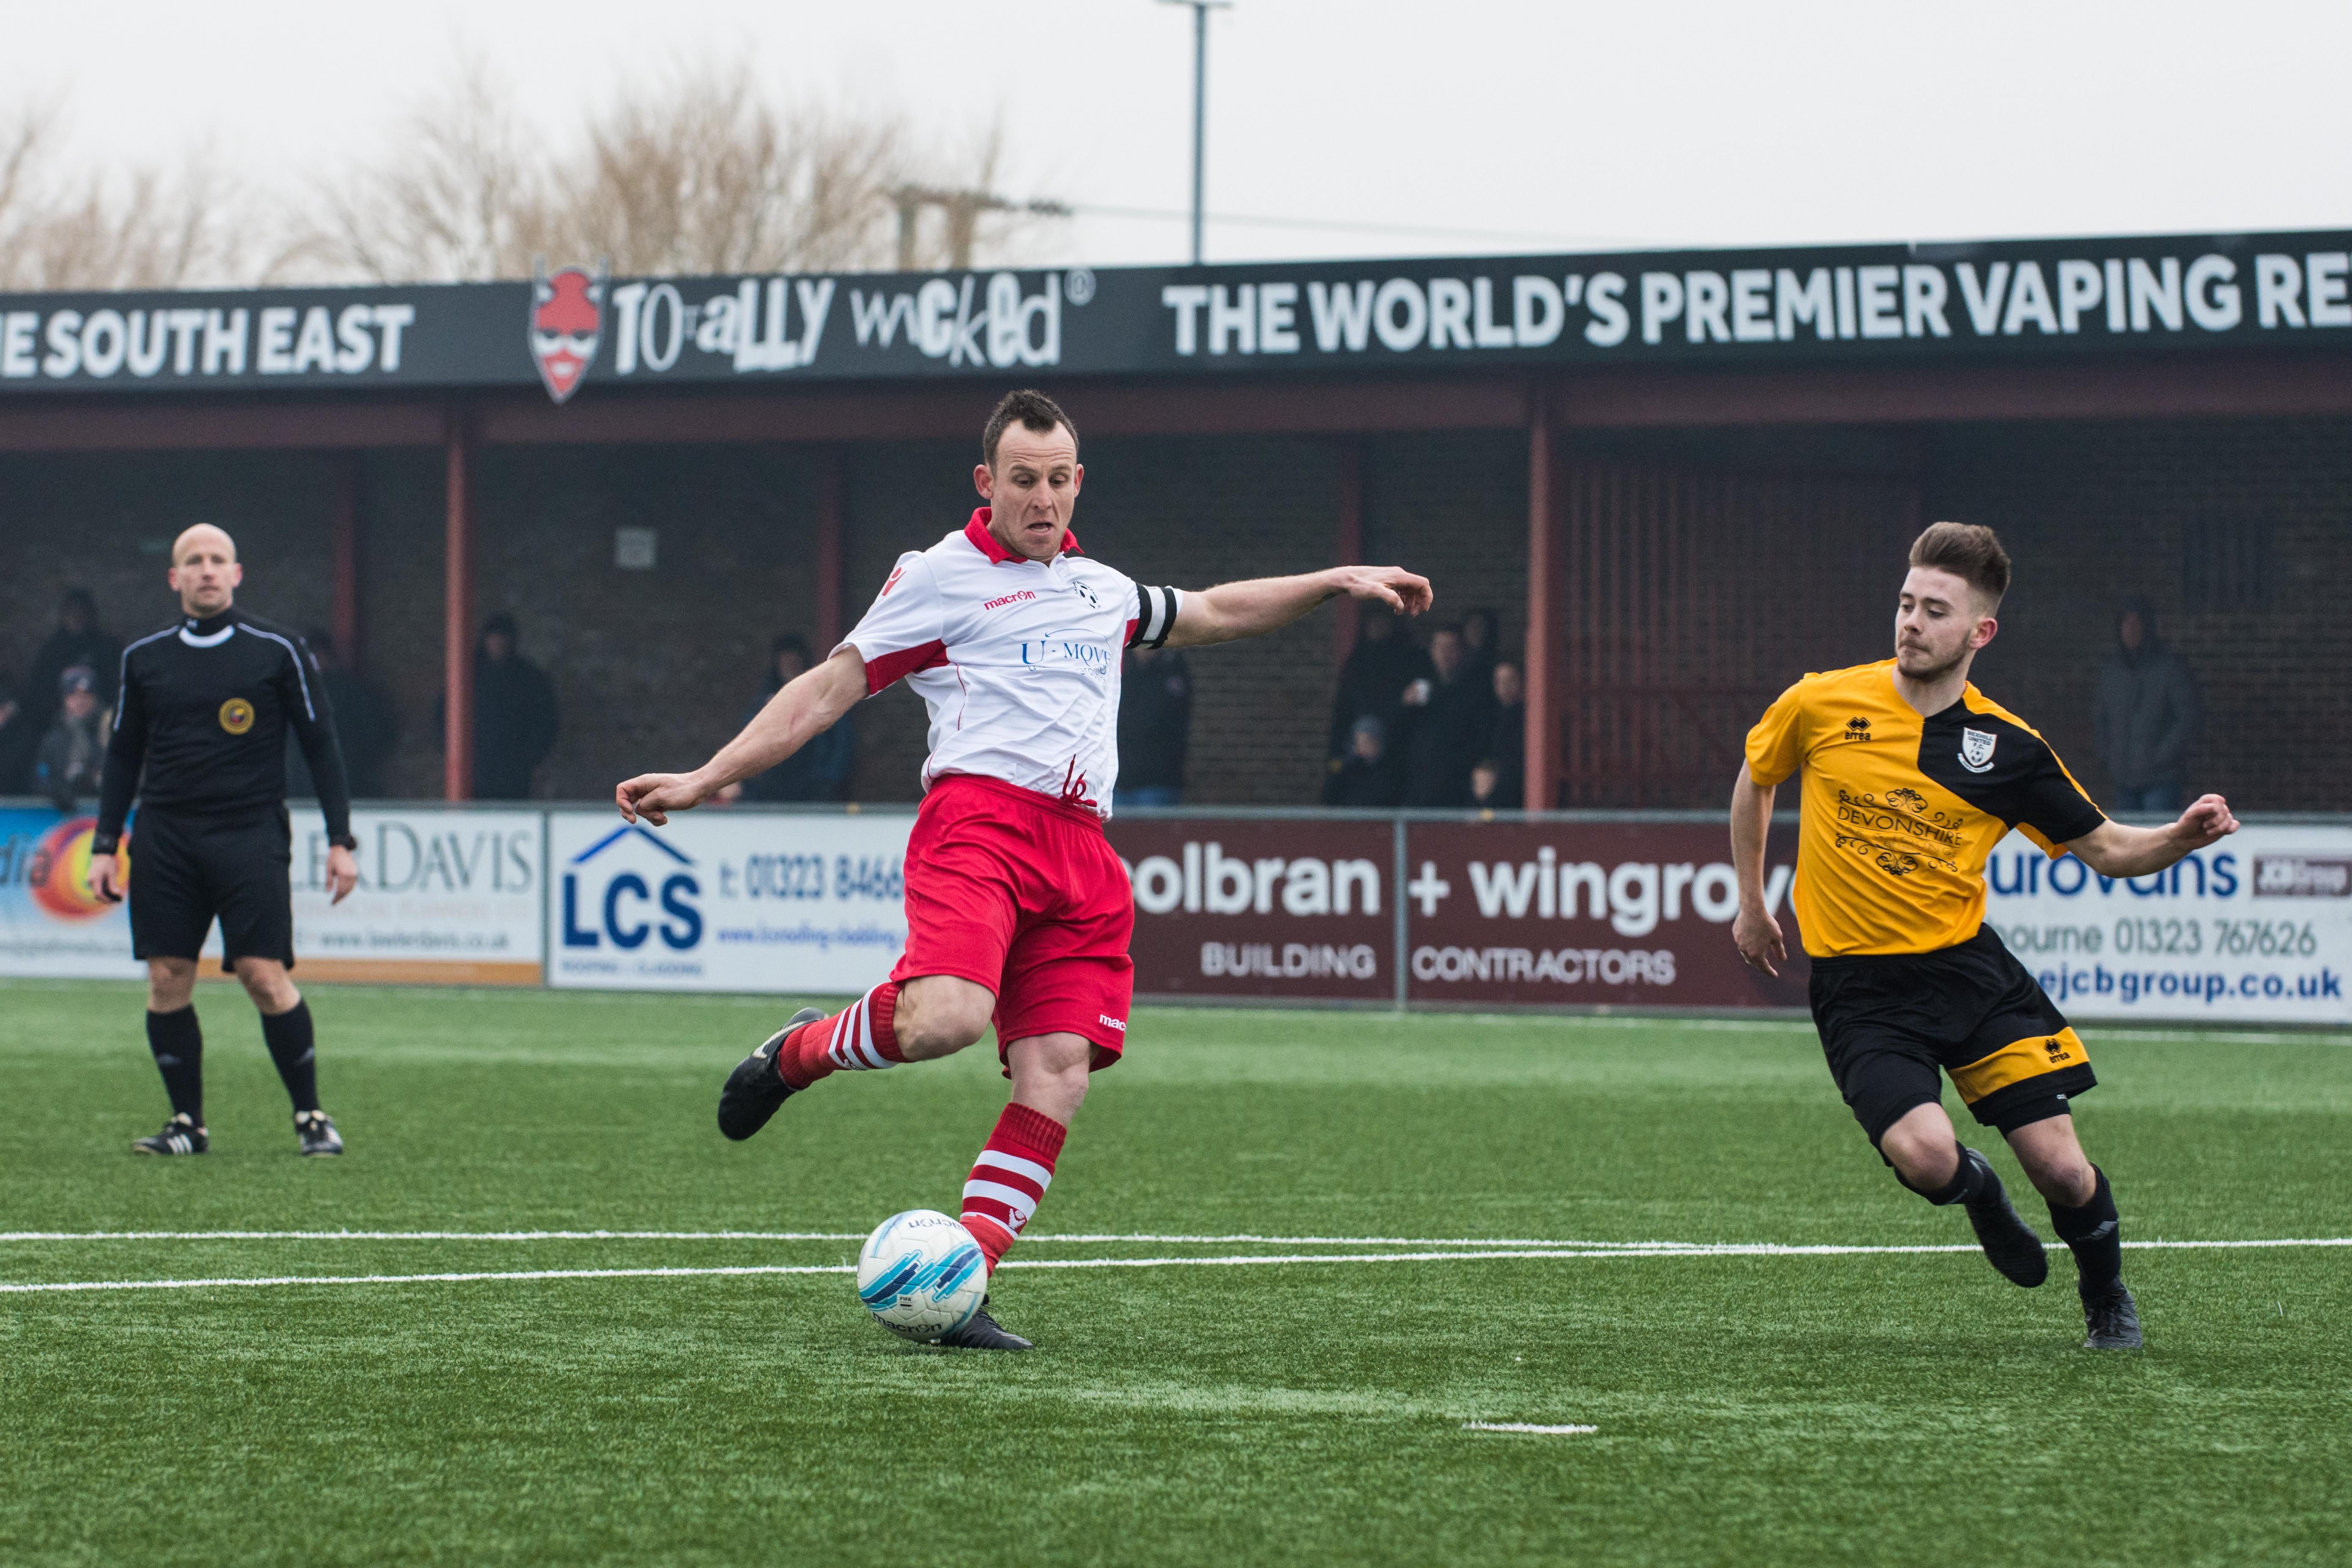 DAVID_JEFFERY Langney Wanderers FC vs Bexhill United FC 03.03.18 52